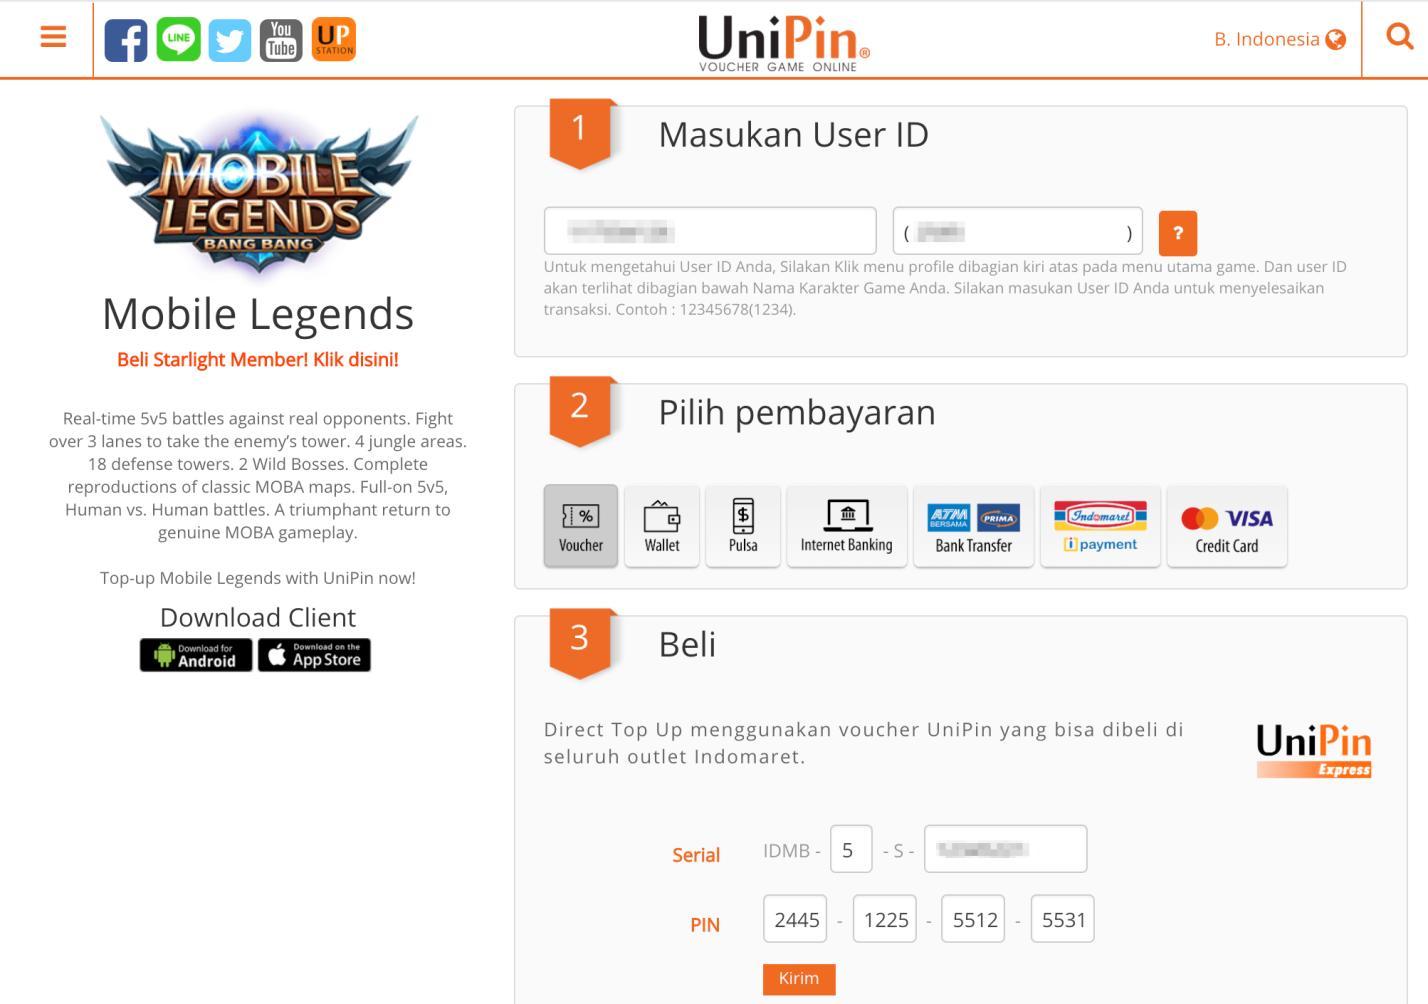 unipin Top up diamond Mobile Legends murah